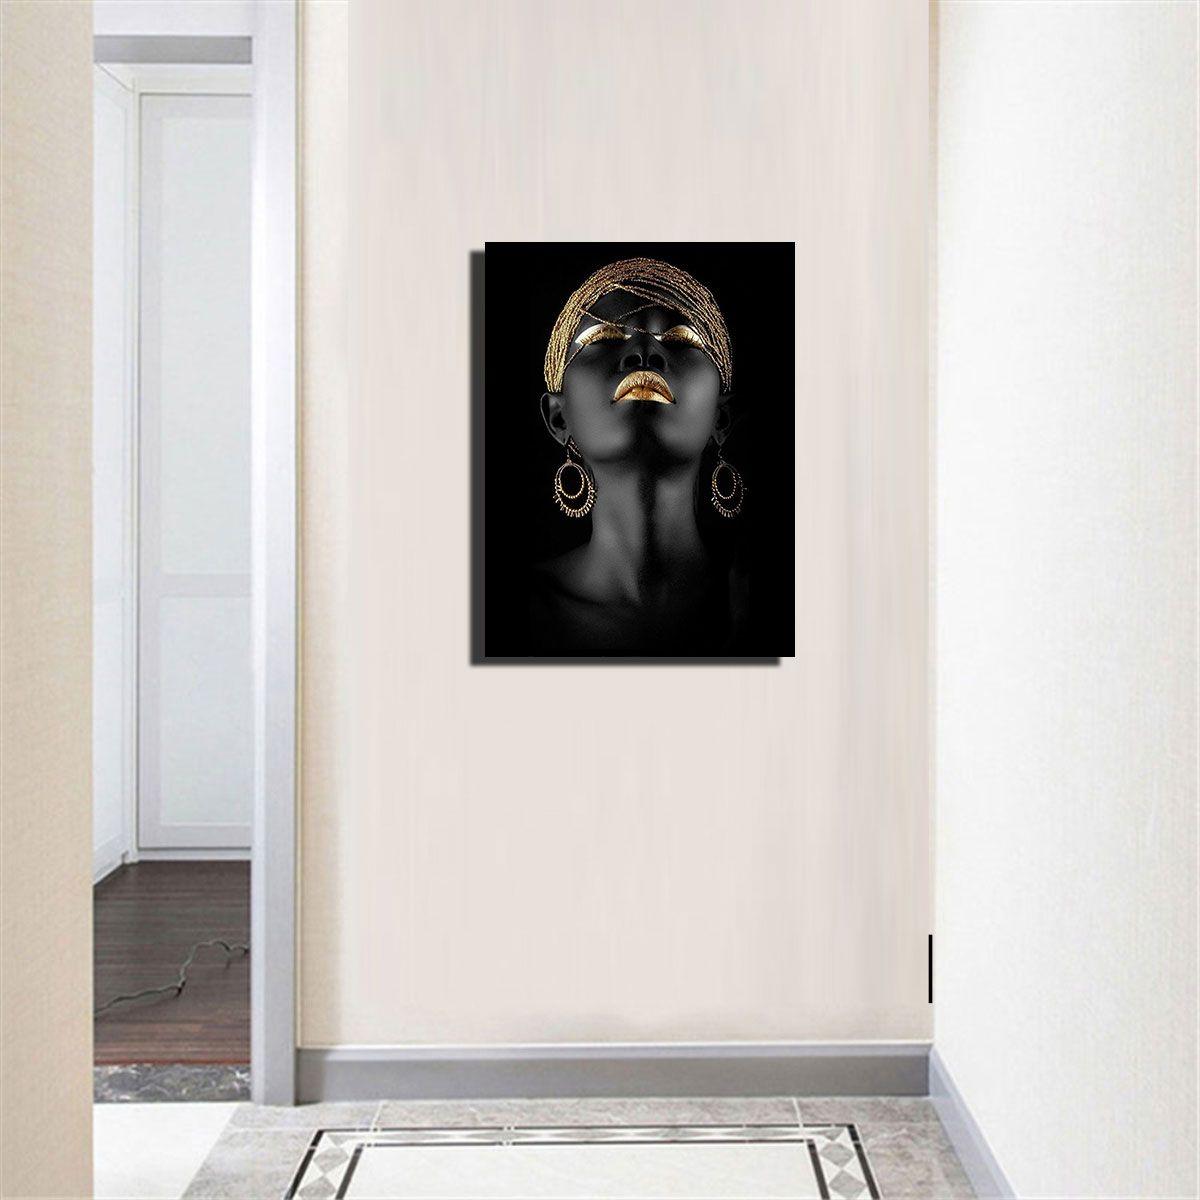 Bohemia Black Lady America Africa pittura retro donne parete Immagine Living Home Decor - 023